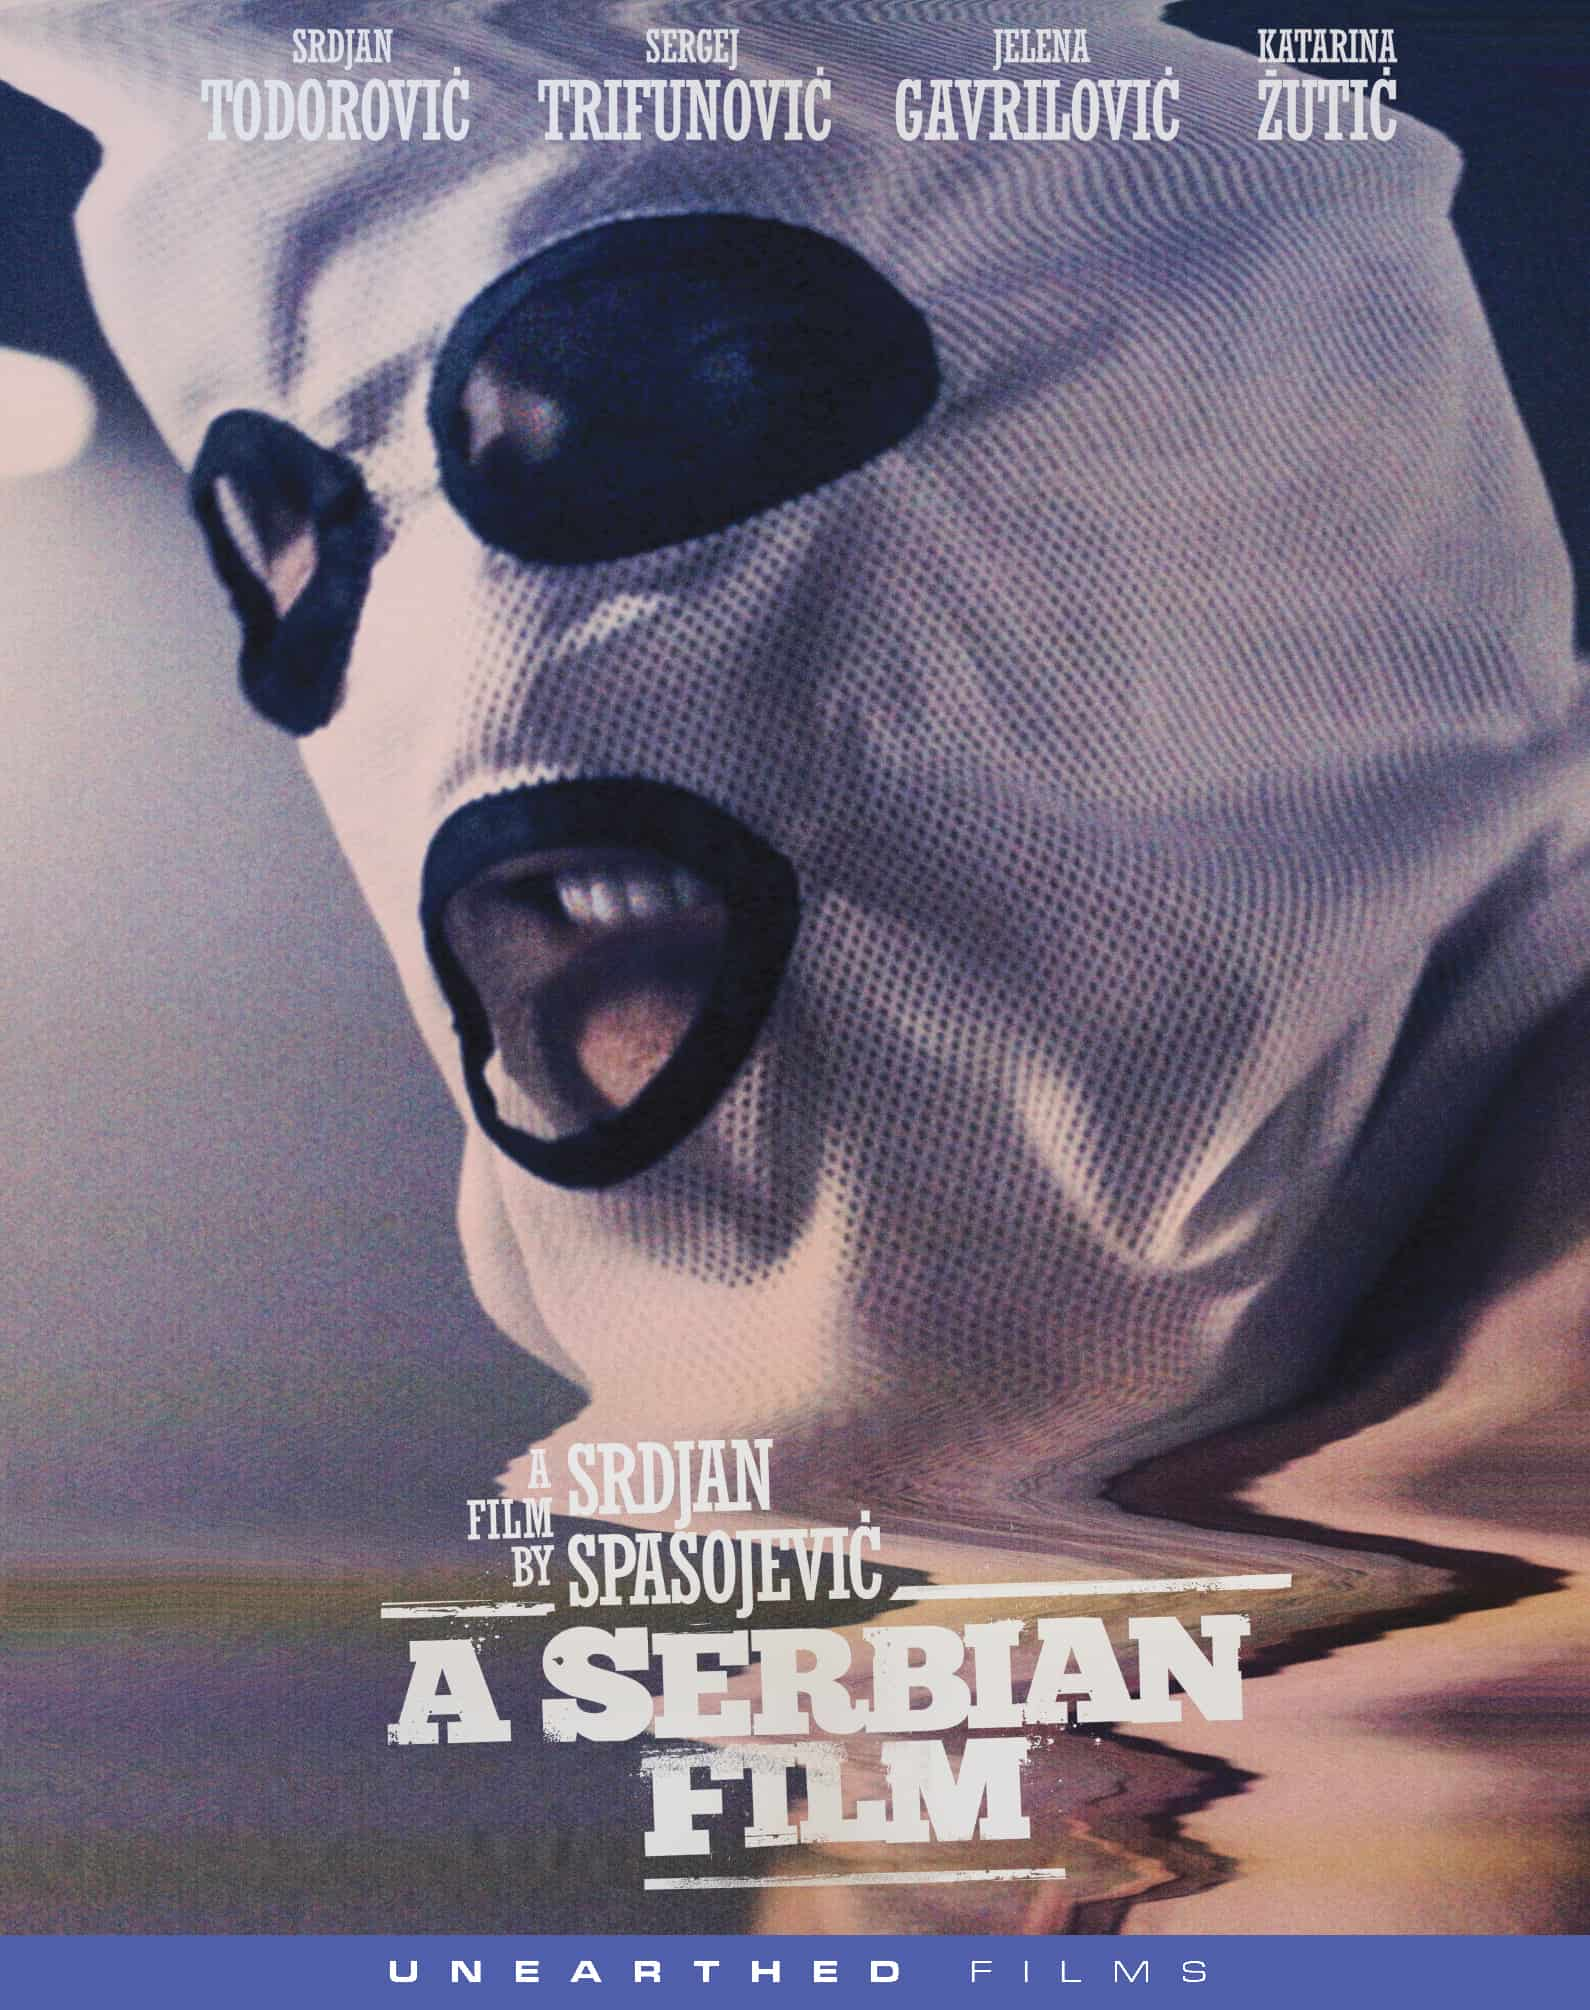 A Serbian Film blu movie